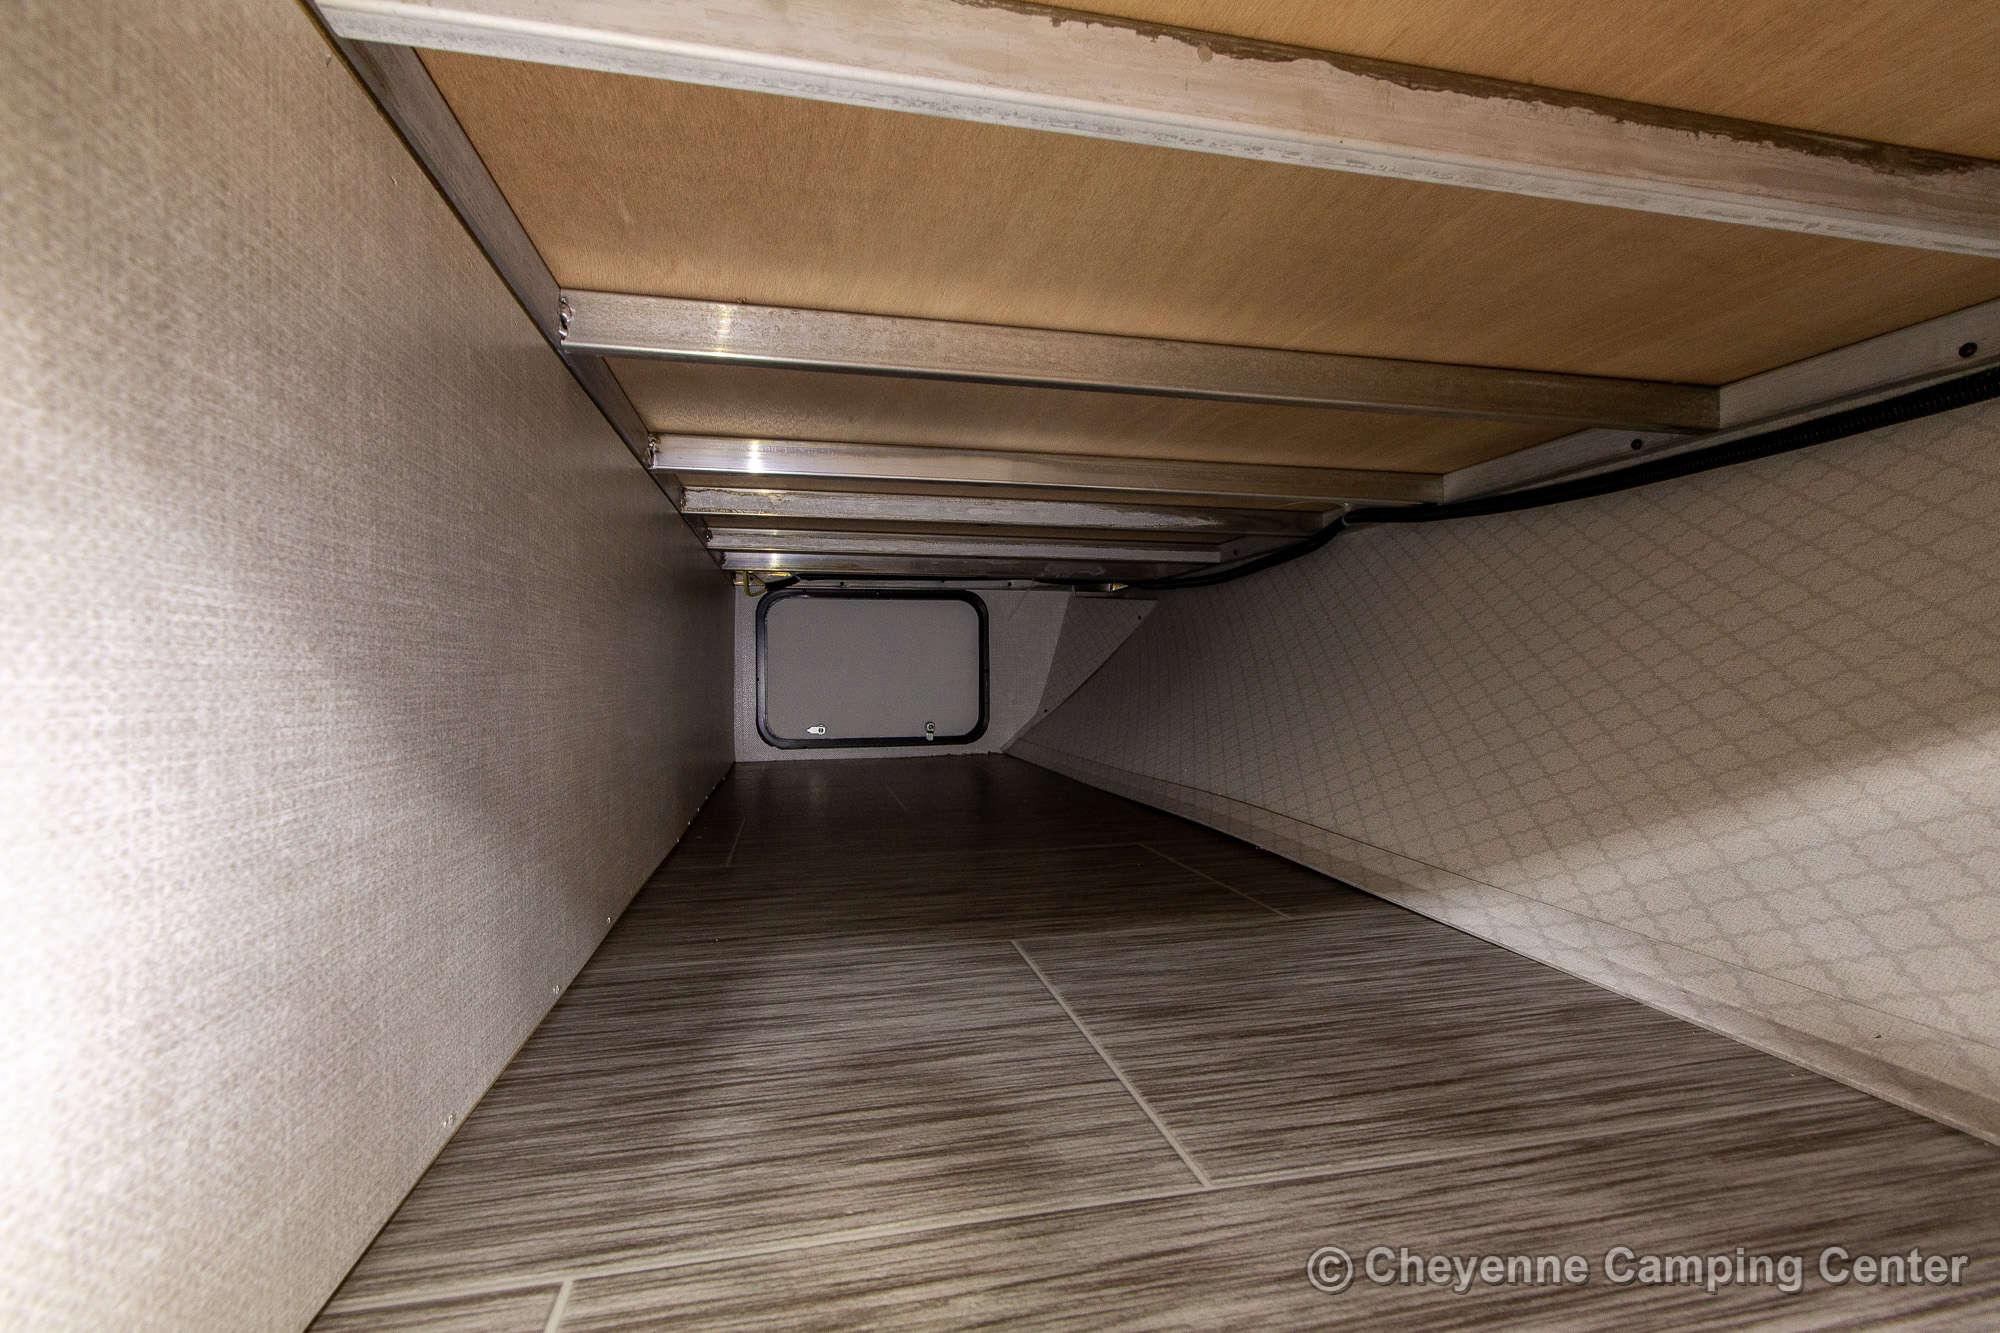 2022 Forest River No Boundaries 19.3 Bunkhouse Travel Trailer Exterior Image